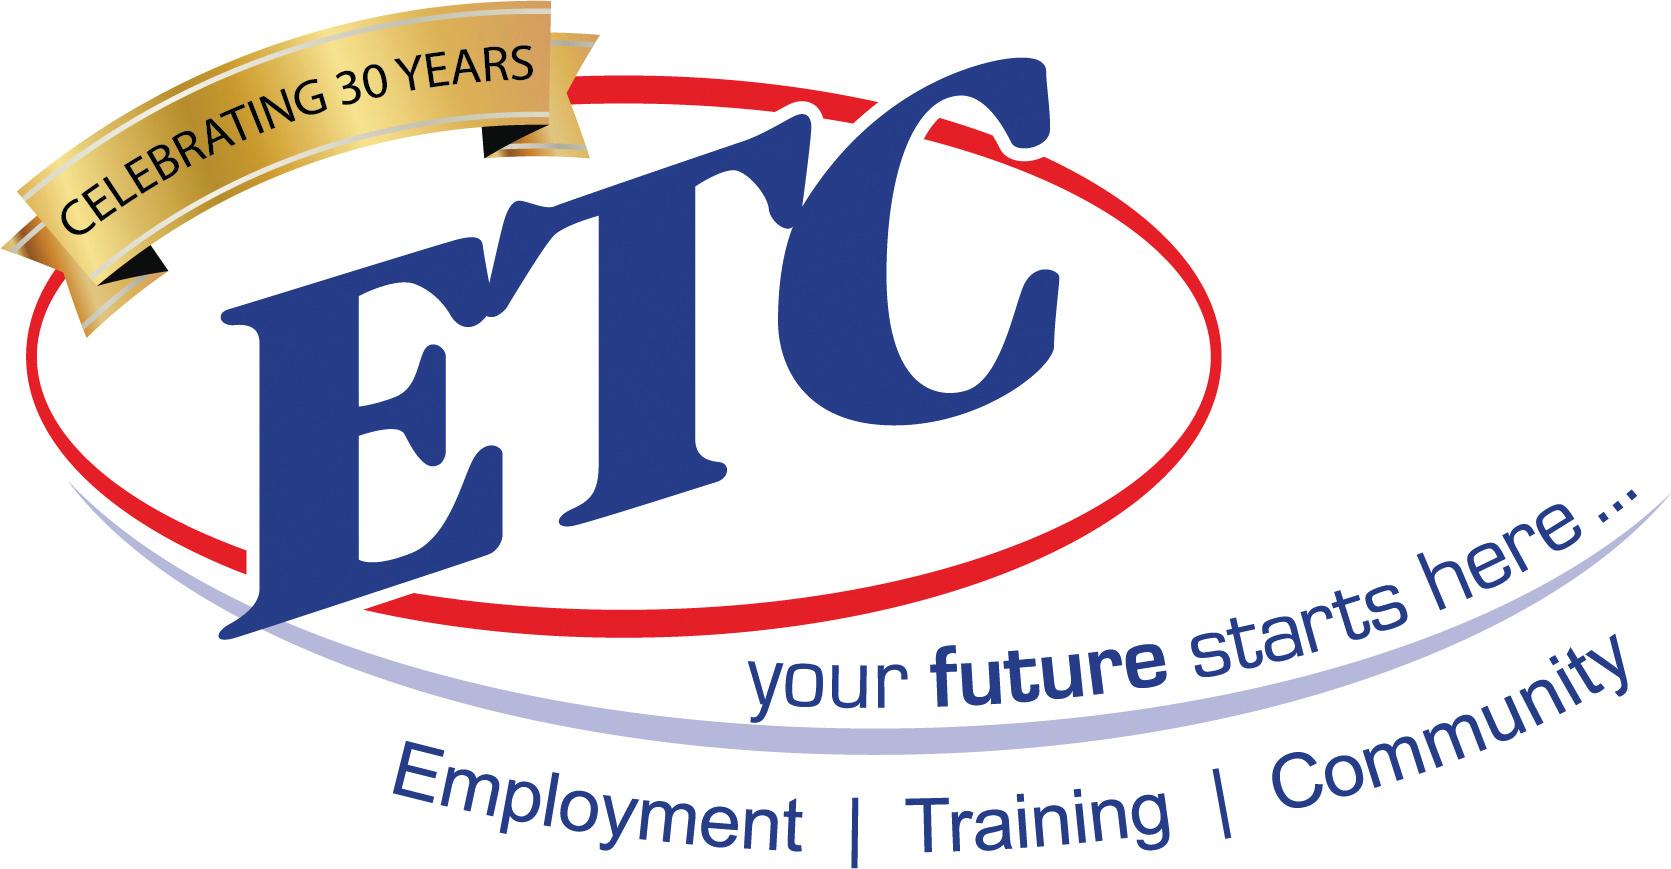 ETC Logo 2015 - 30 years - PRINT